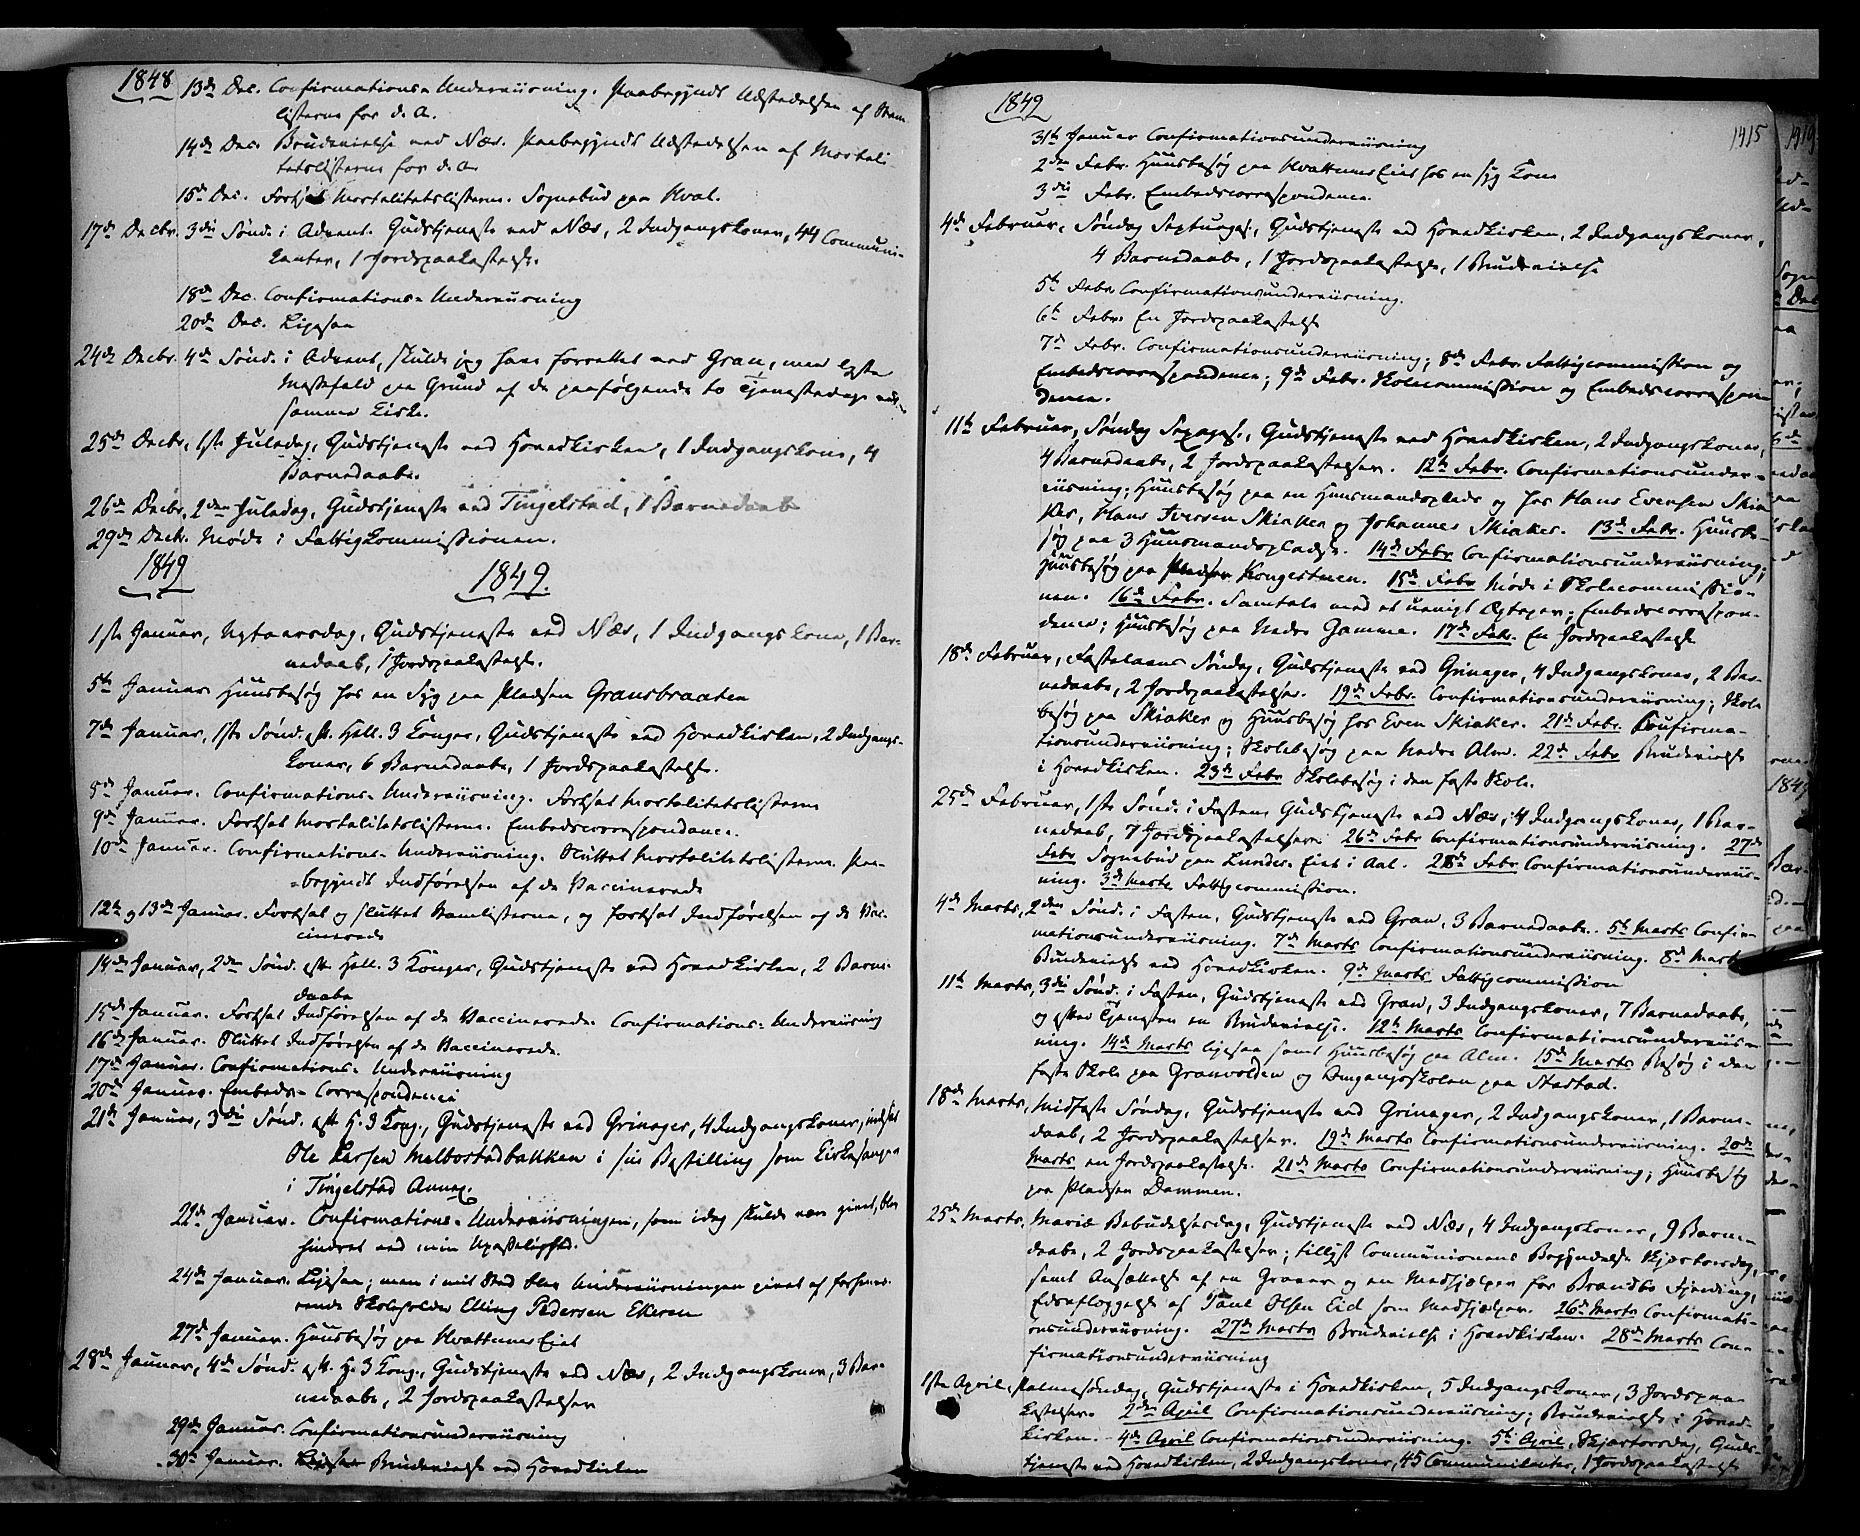 SAH, Gran prestekontor, Ministerialbok nr. 11, 1842-1856, s. 1414-1415